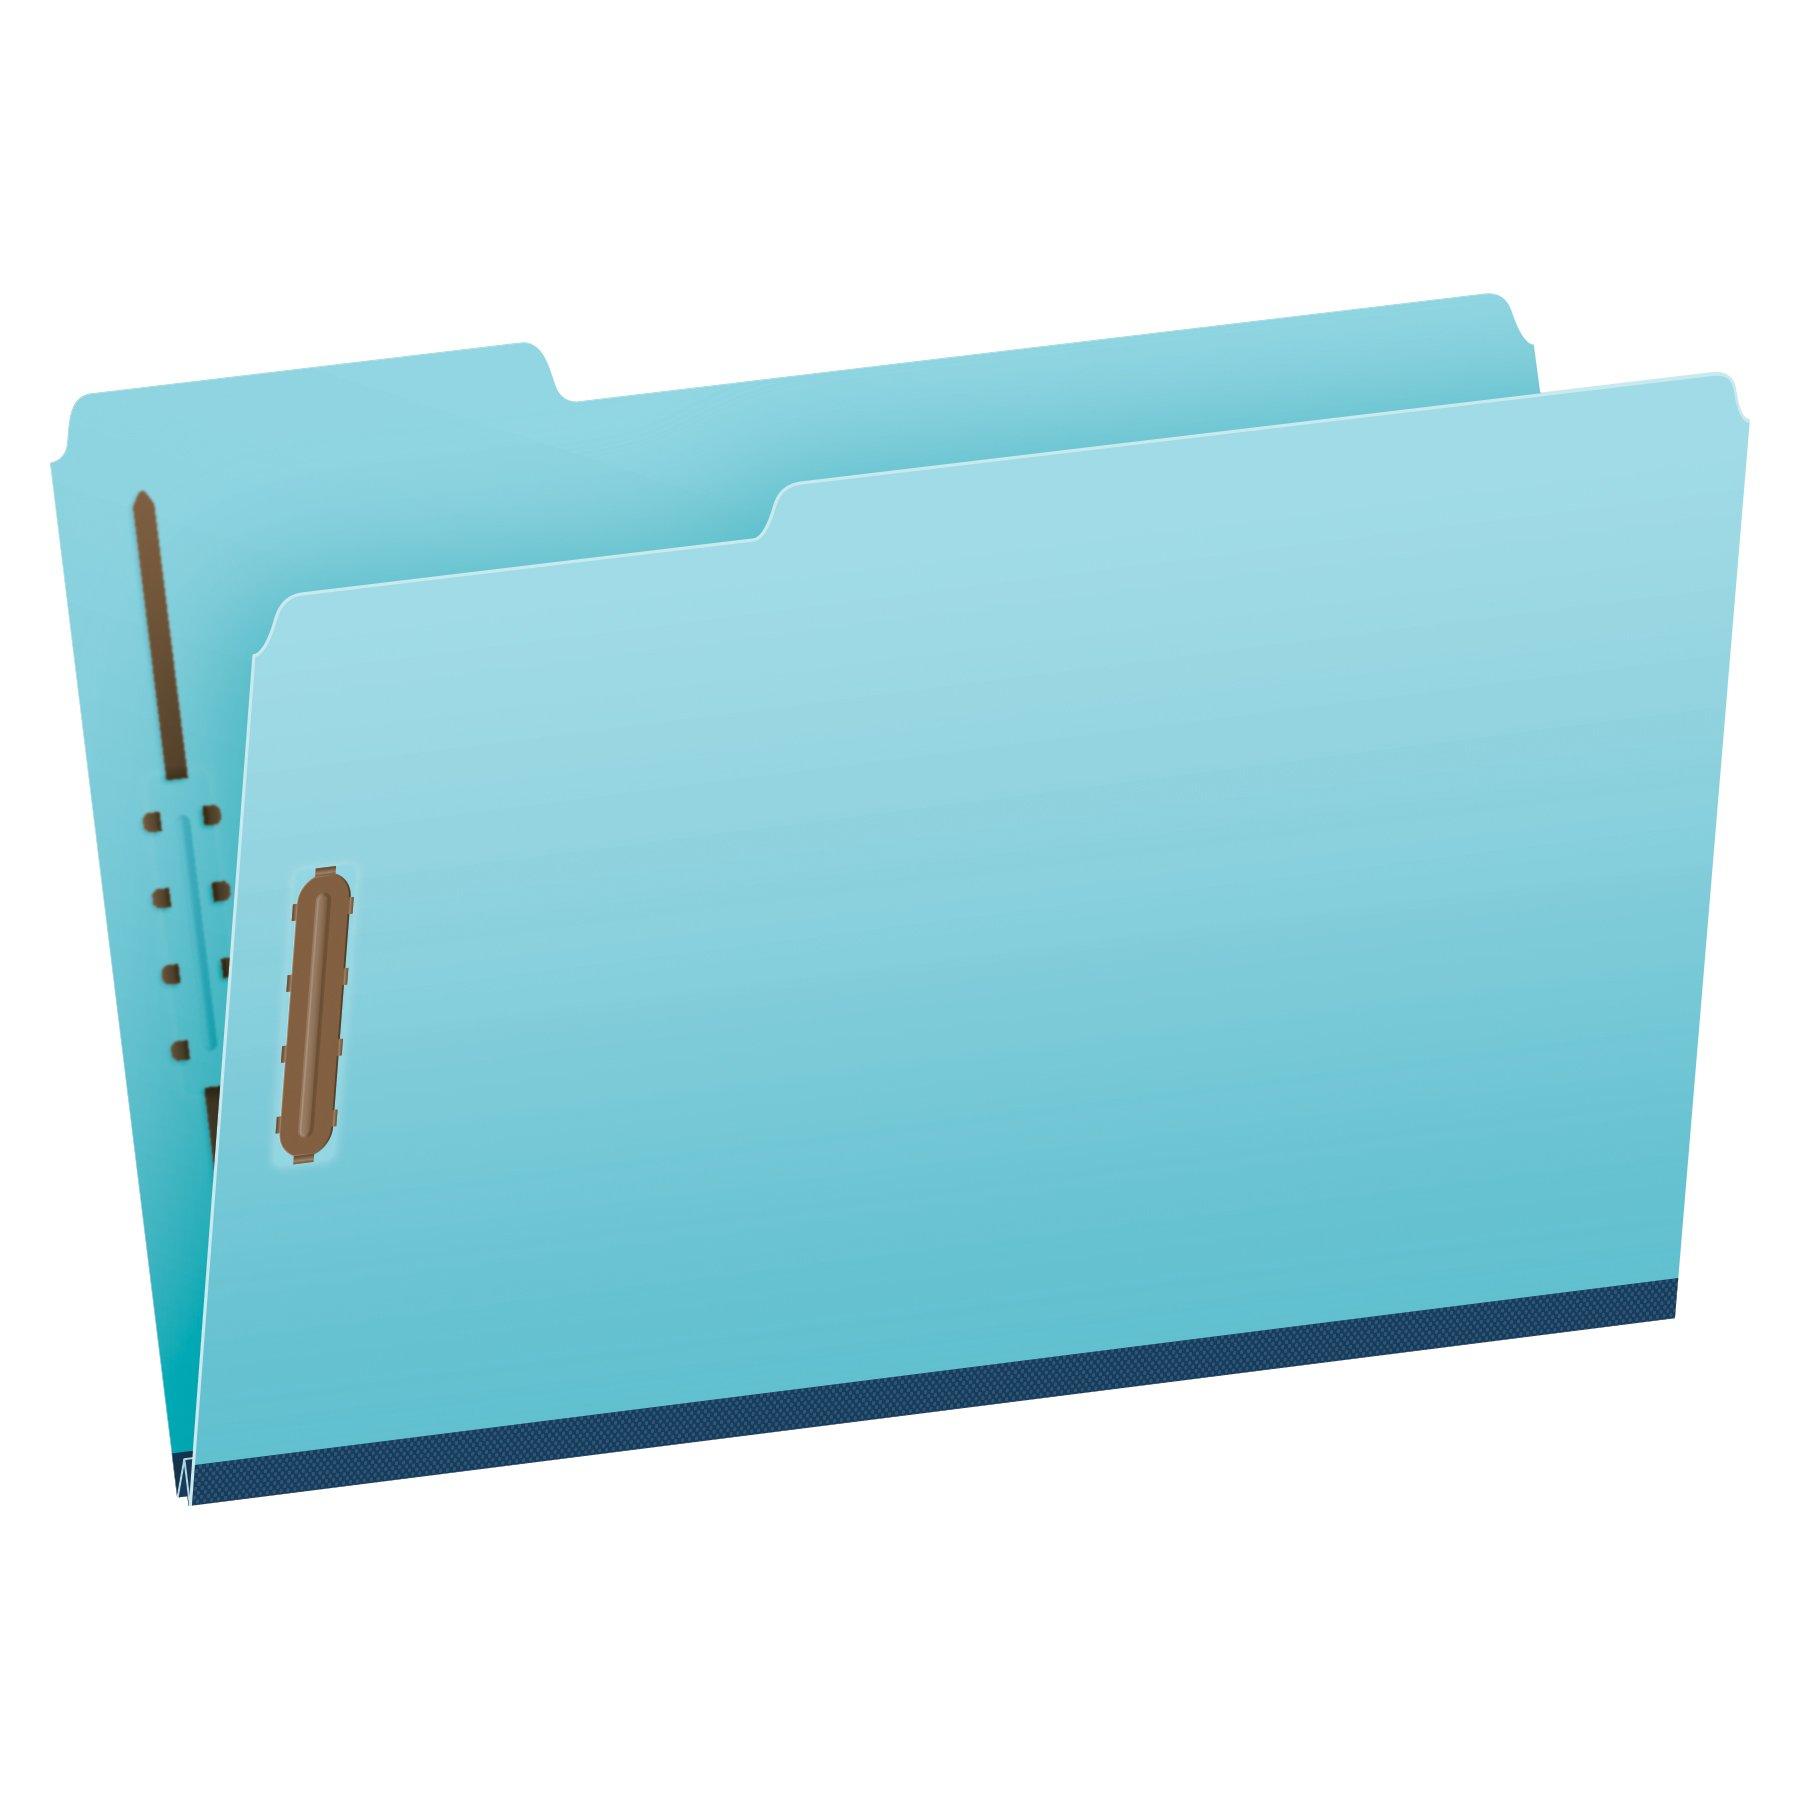 Pendaflex Pressboard Fastener Folders, Legal Size, Light Blue, 1'' Expansion, 1/3 Cut, 25/BX (616F21-3BLU) by Globe Weis